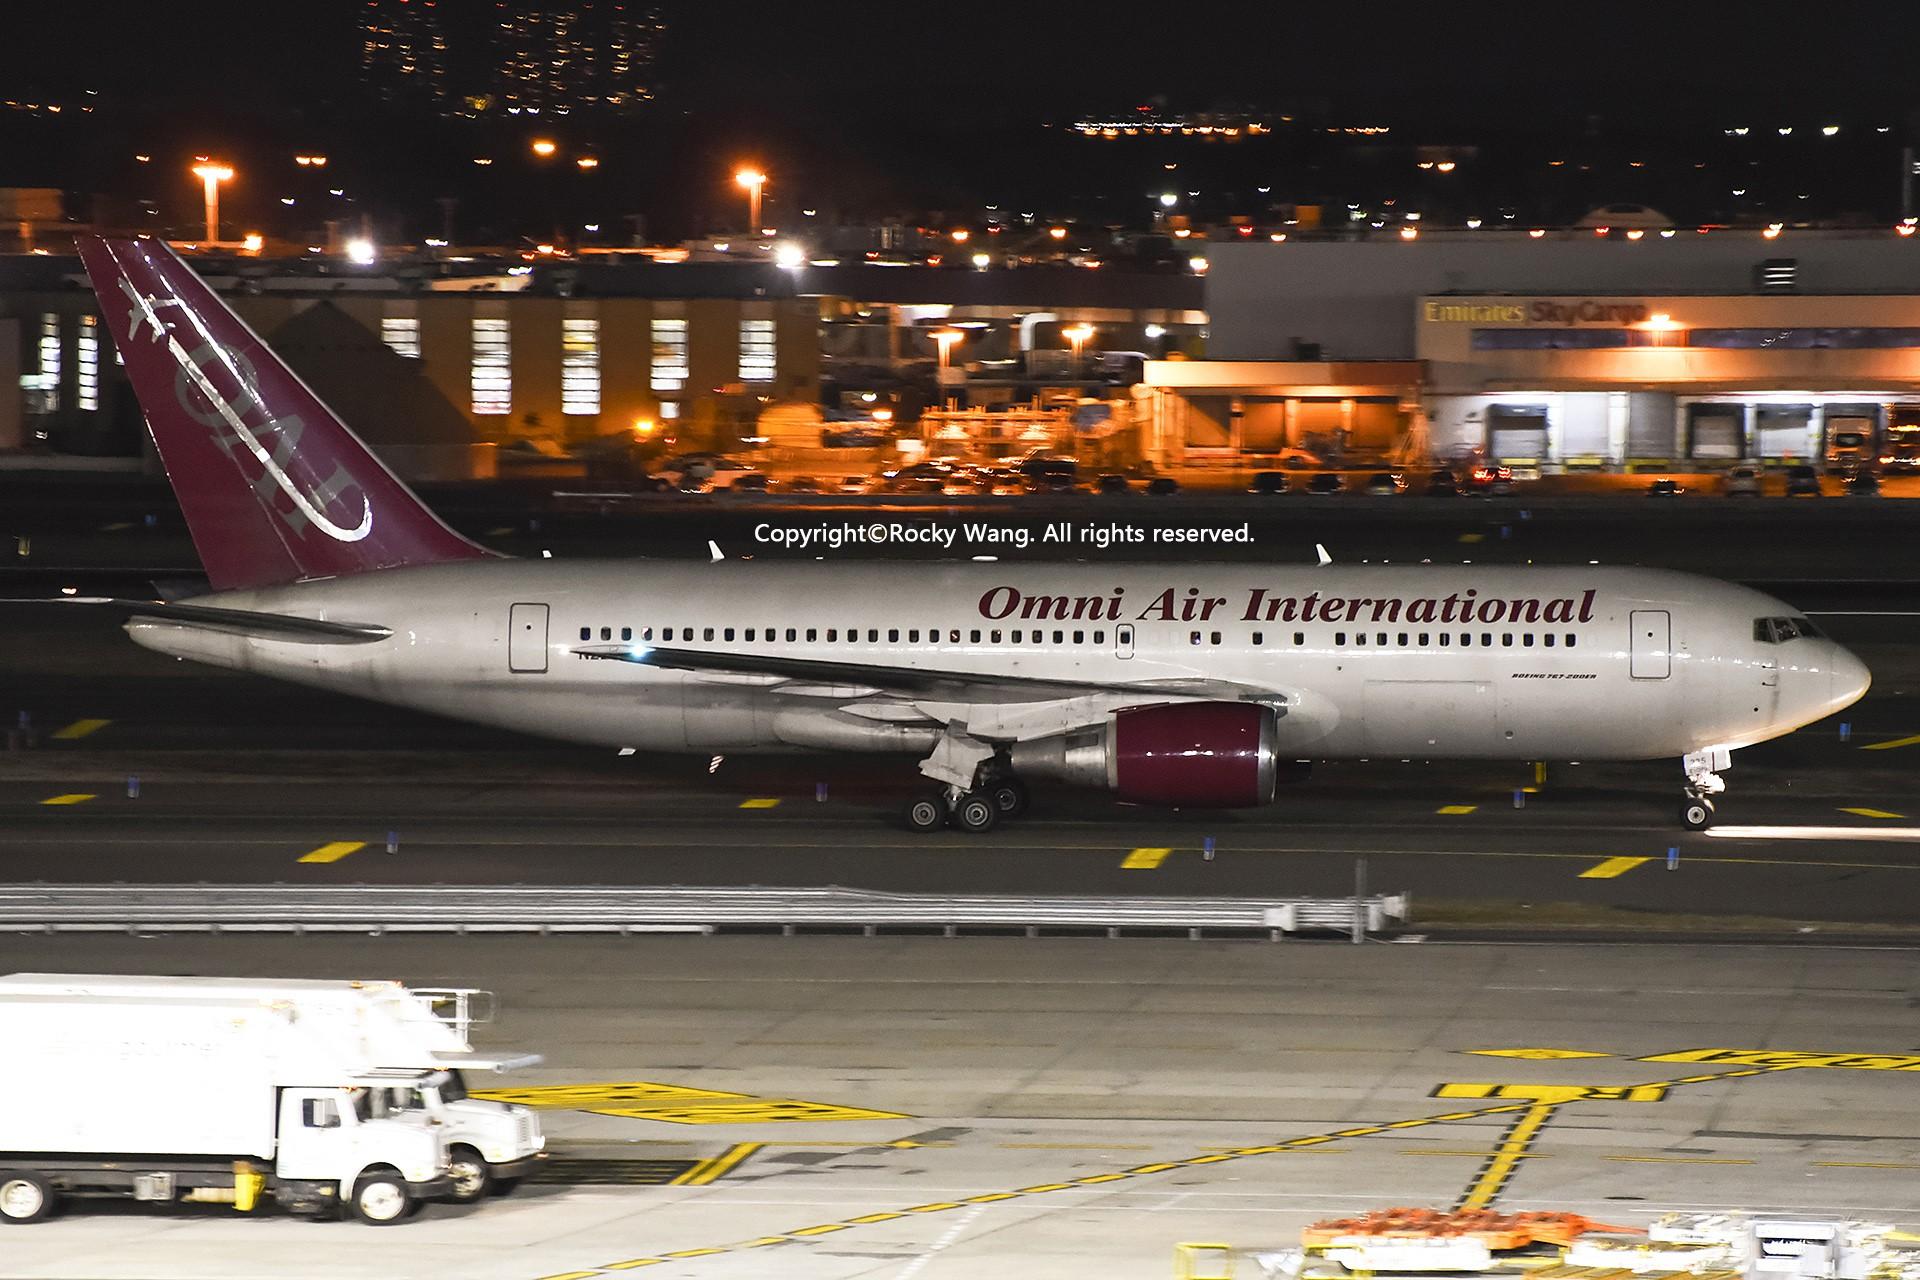 Re:[原创]KJFK 30图 BOEING 767-224(ER) N225AX New York John F. Kennedy Int'l Airport